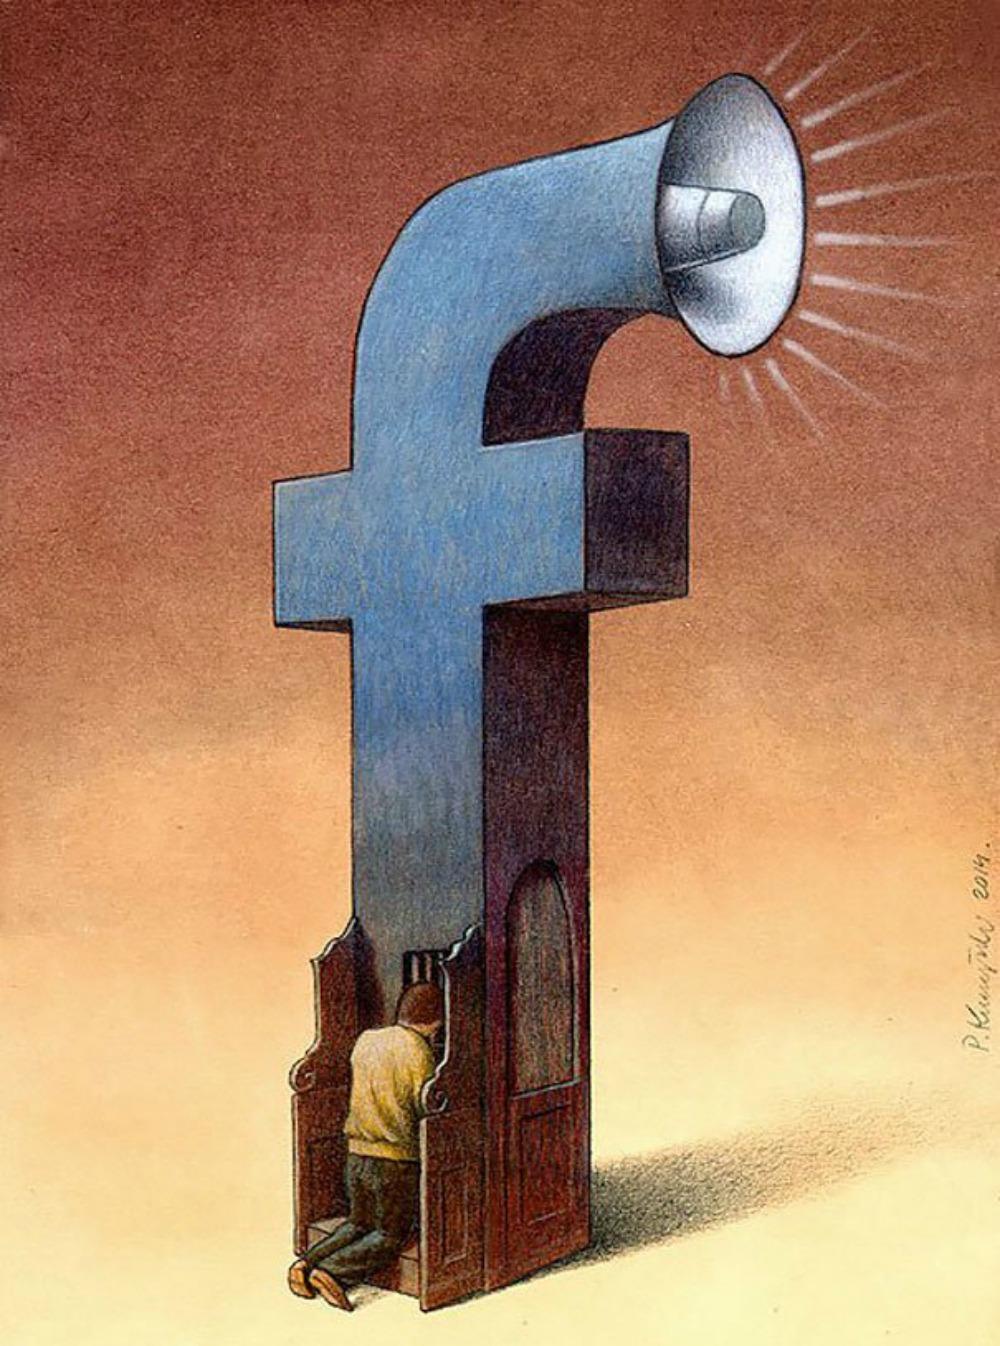 Satirical_Illustrations_Addiction_to_Technology15